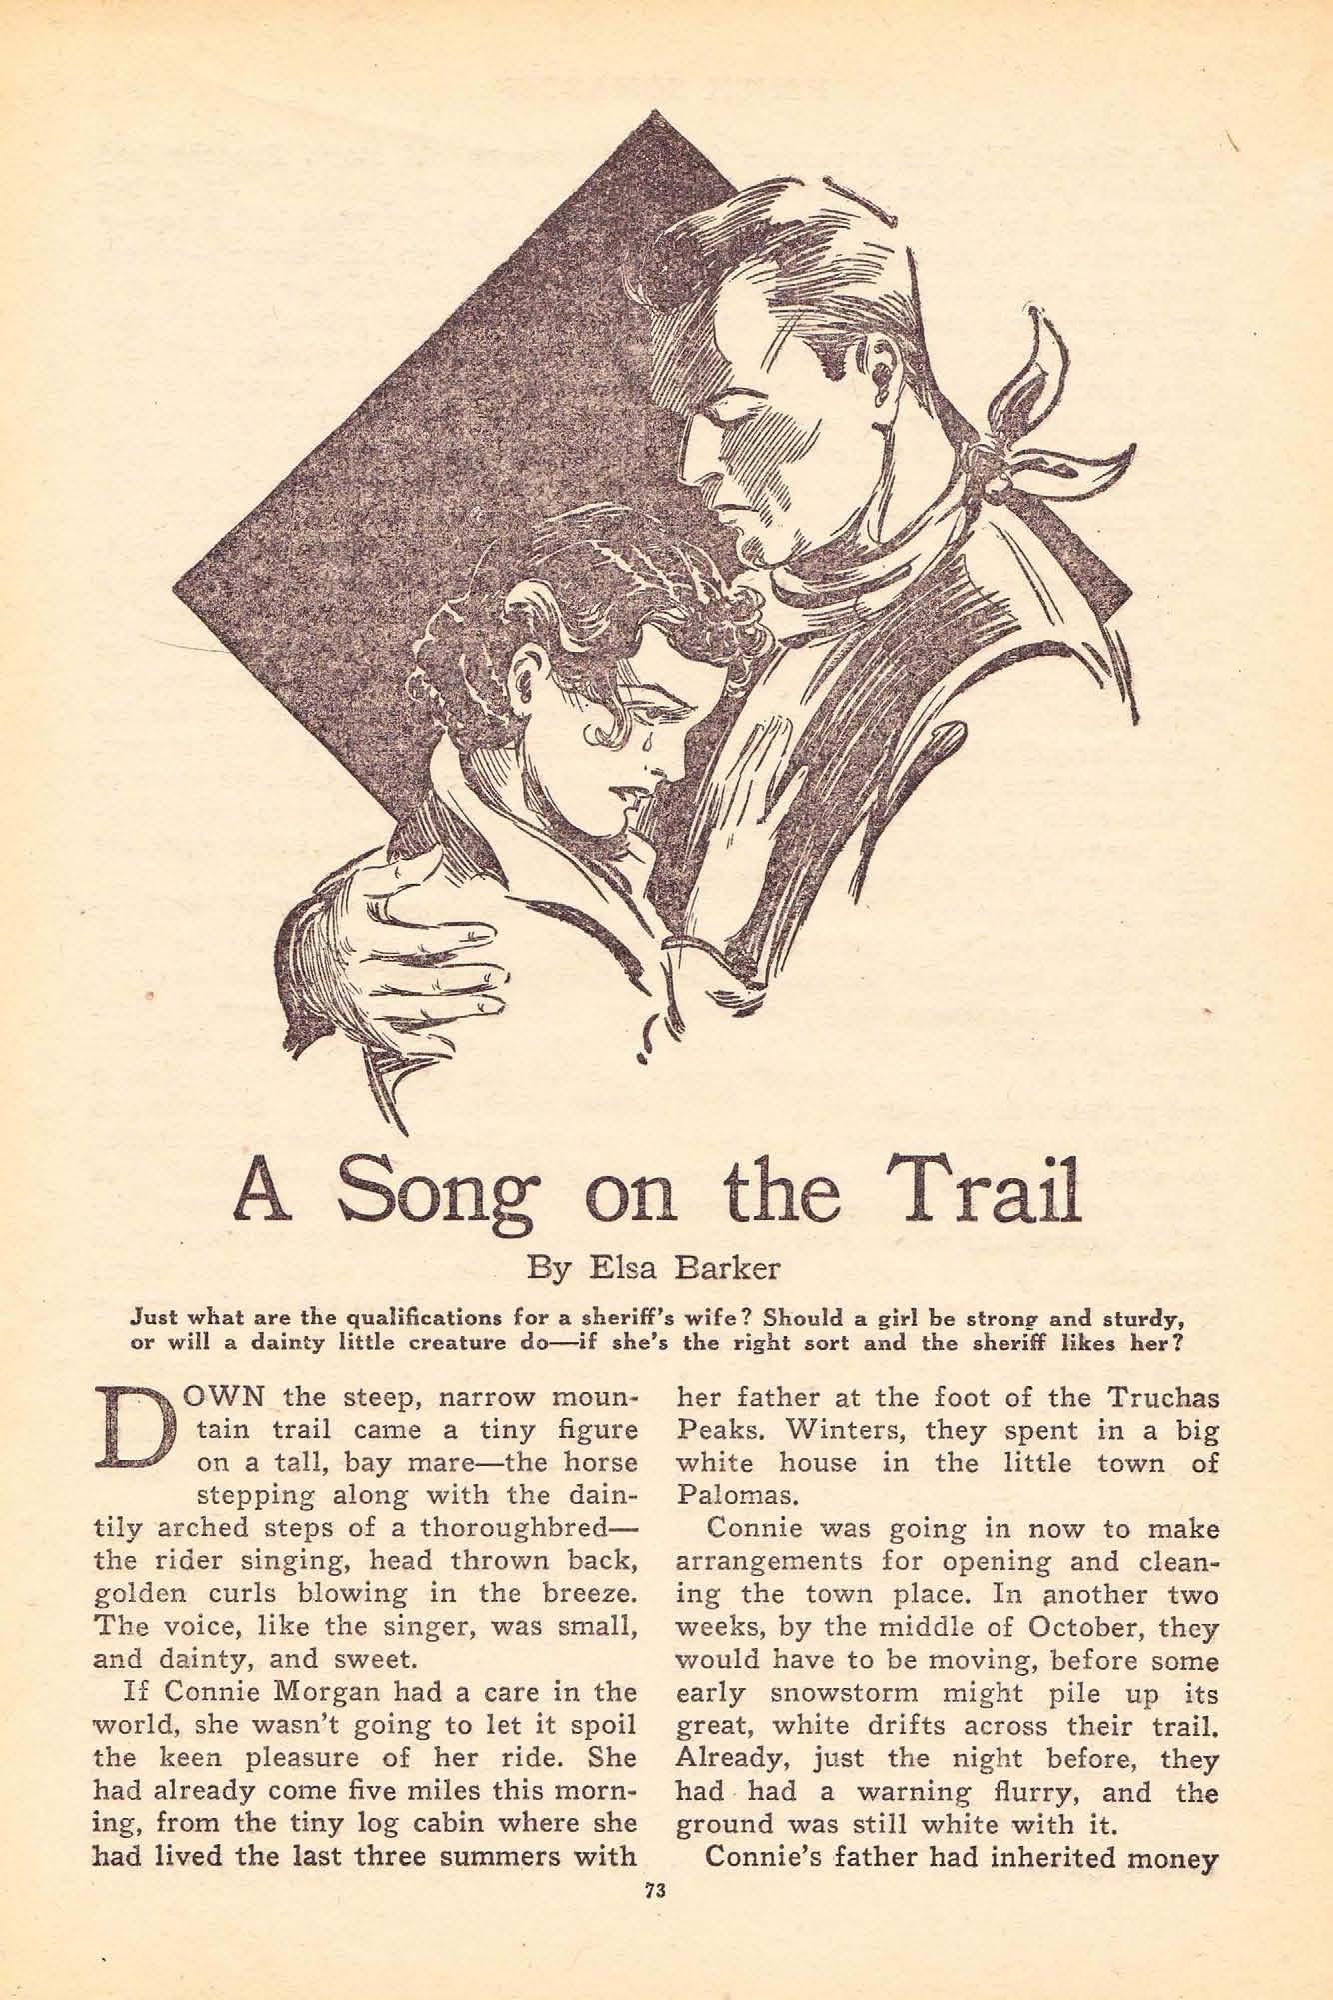 Ranch Romances Vol  L, No  1 (September 1, 1933), ed  by